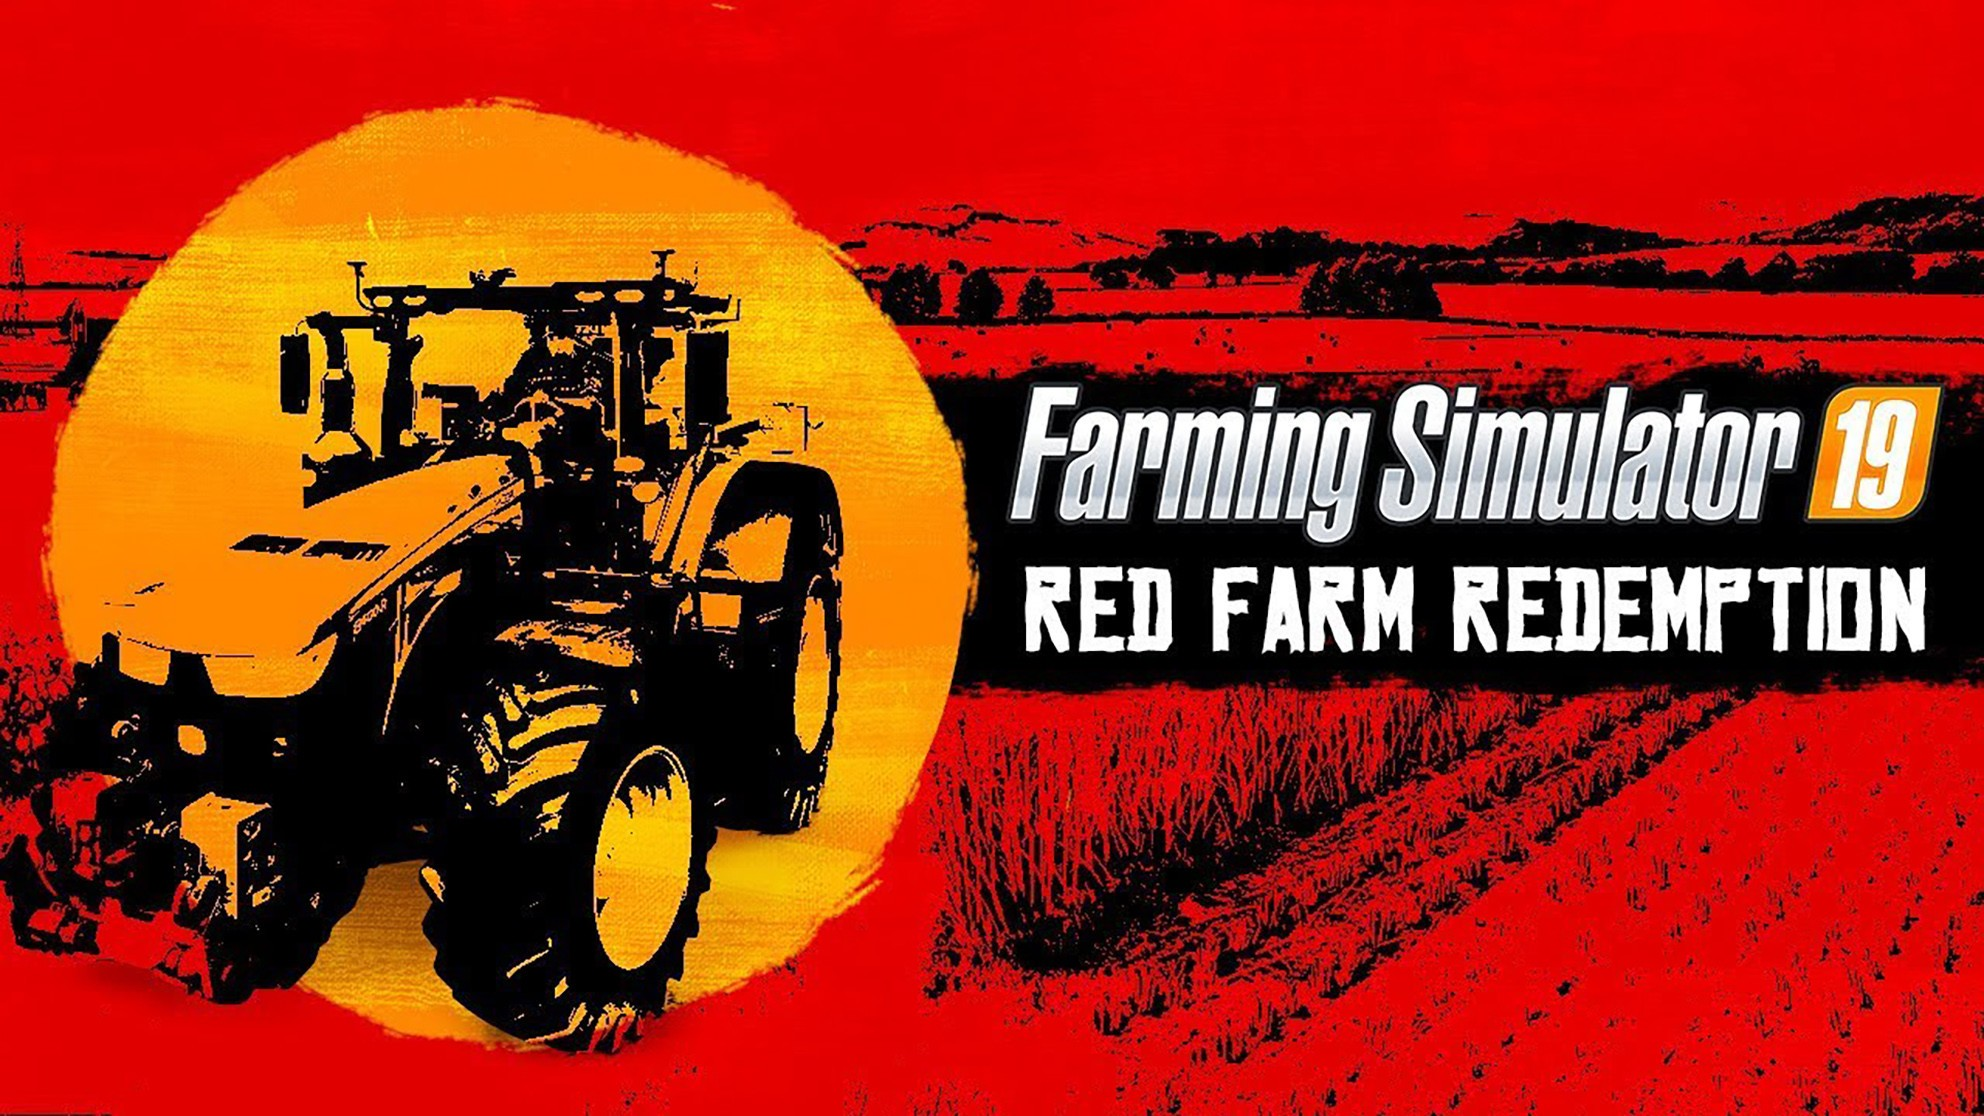 Farming Simulator 19 devs used Red Dead Redemption 2 theme in a clip